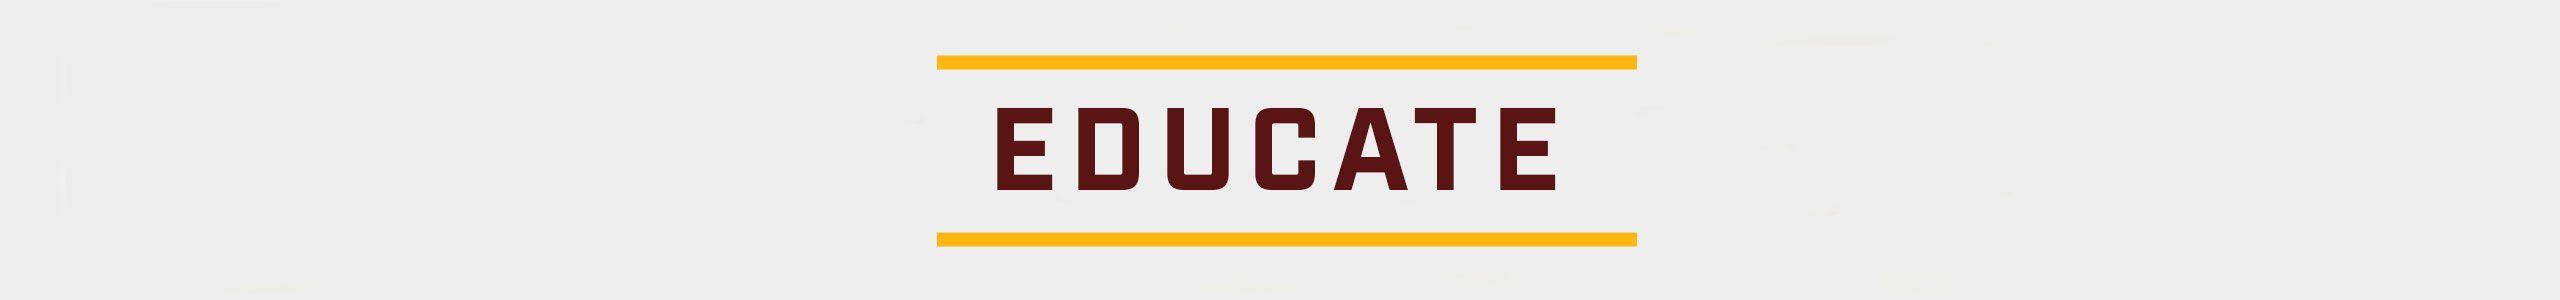 dmvotes_educate_v2